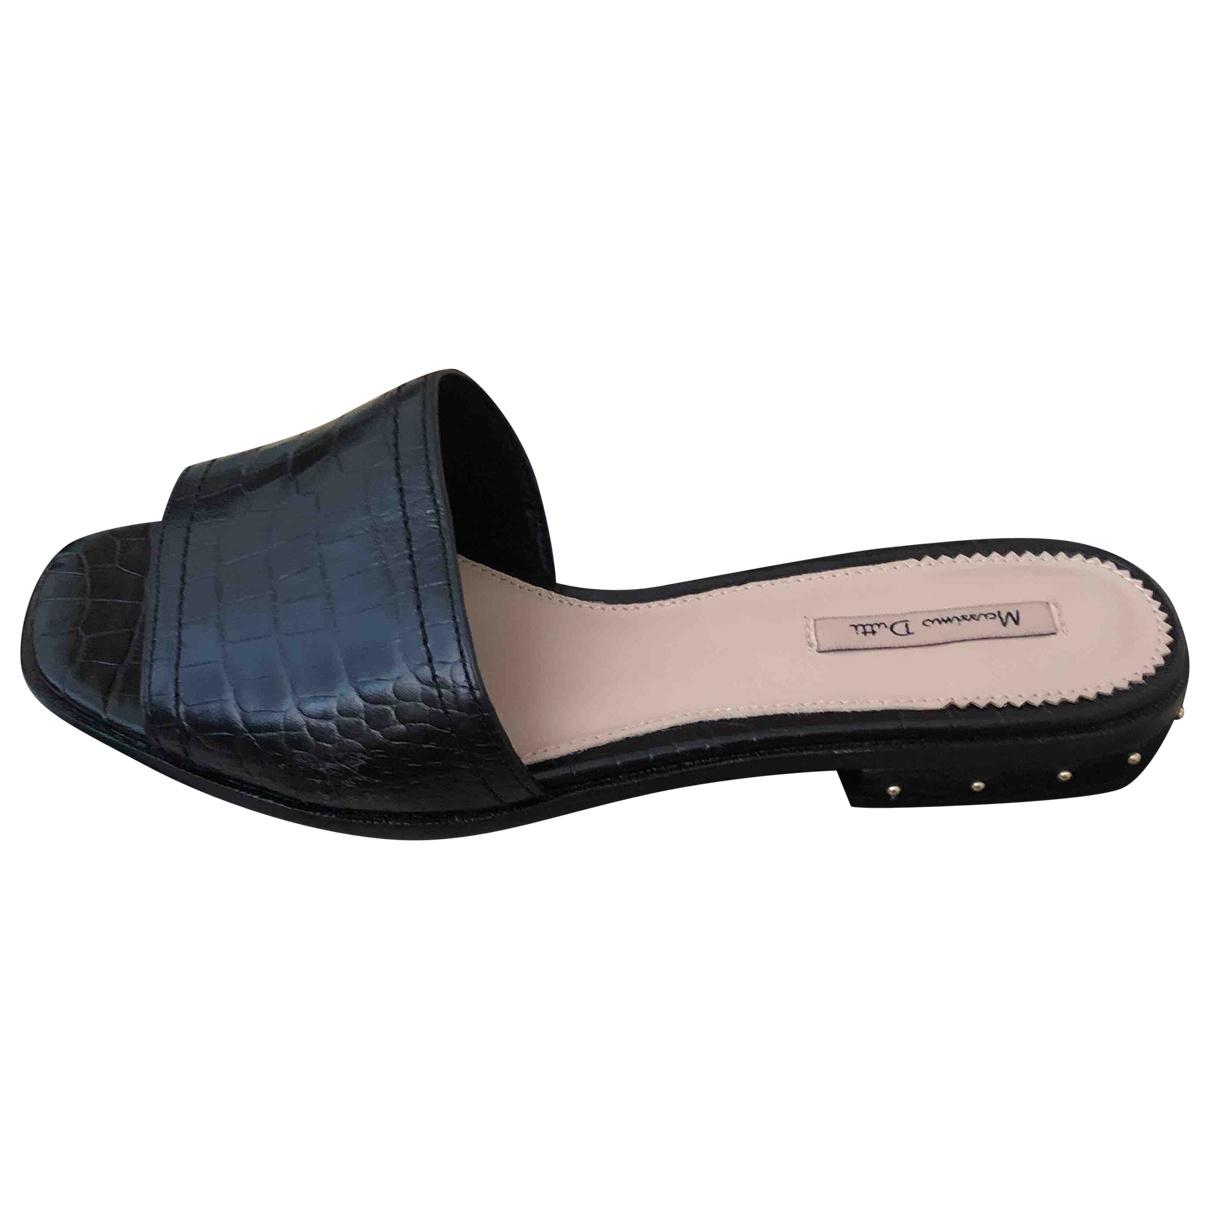 Massimo Dutti \N Black Leather Sandals for Women 38 EU